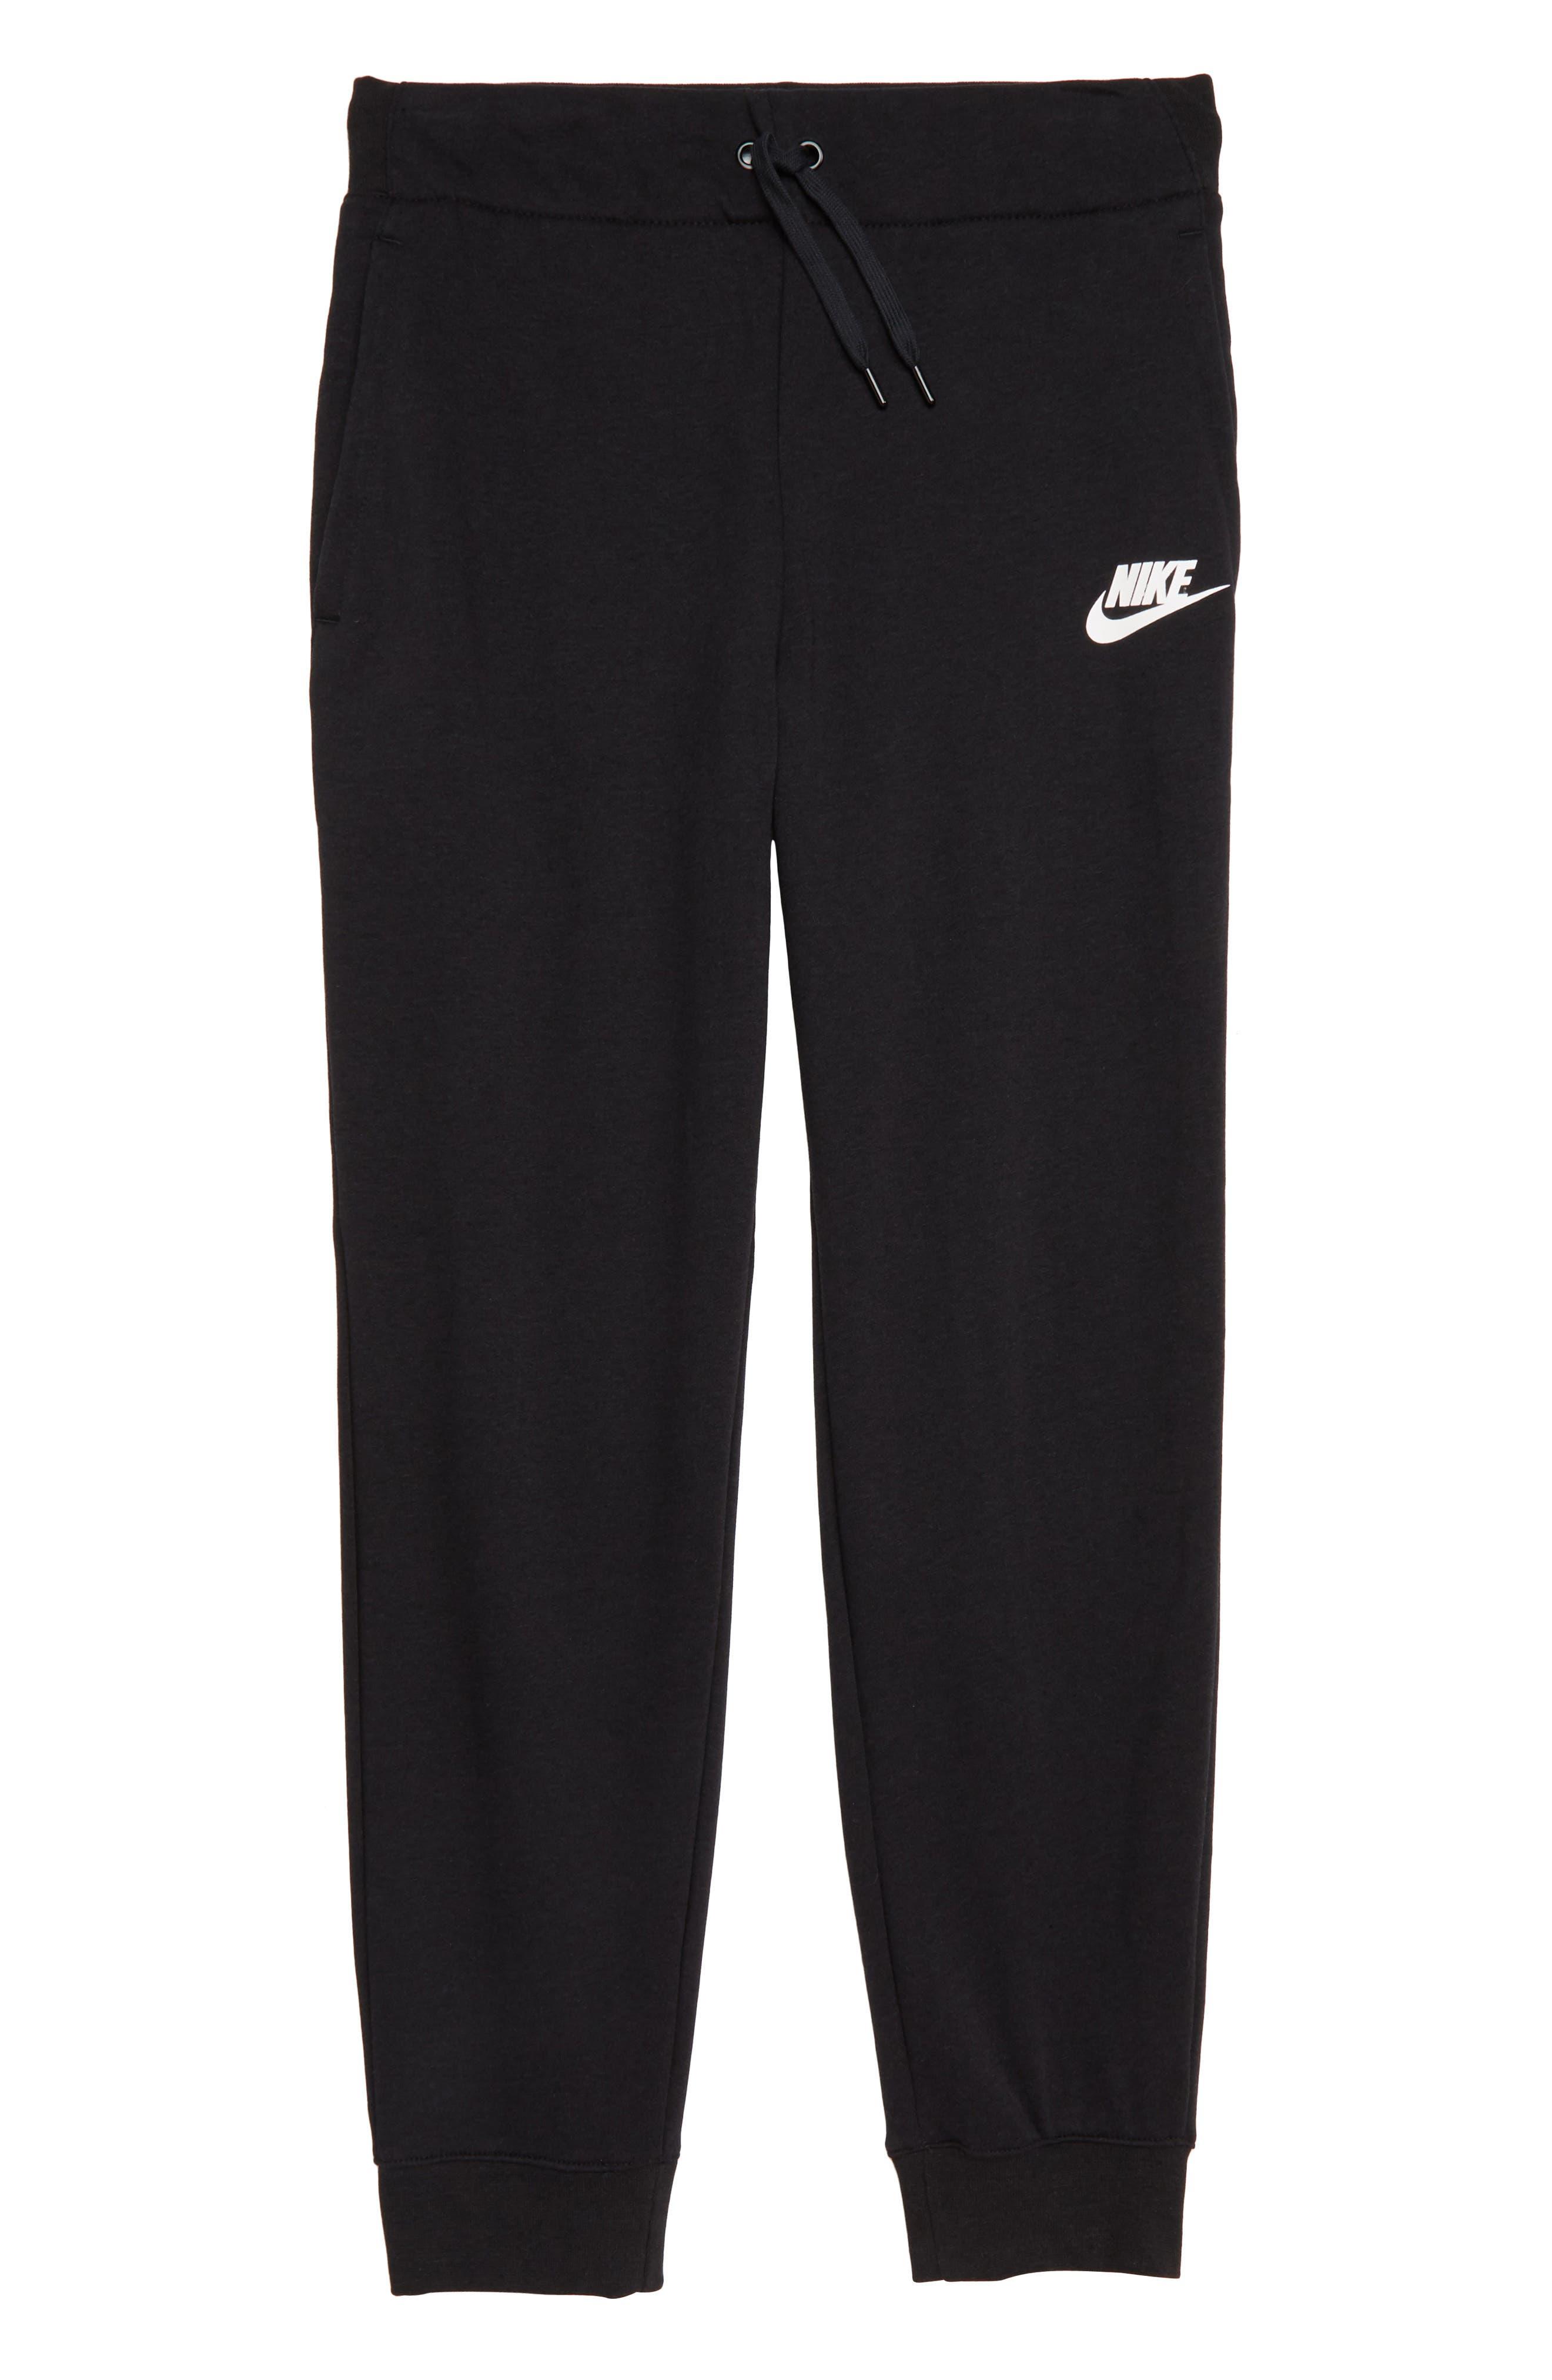 Sportswear PE Pants,                         Main,                         color, BLACK/ WHITE